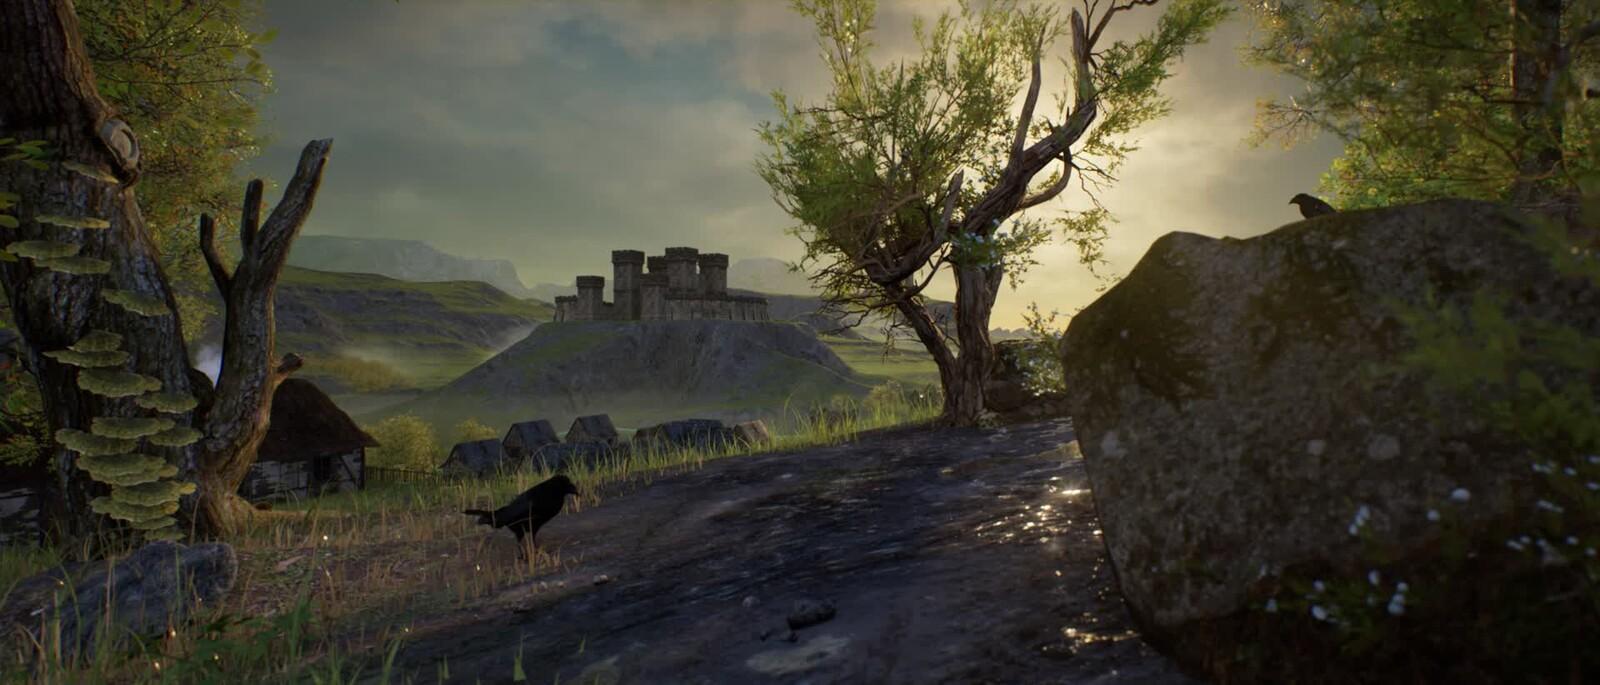 Medieval Scene - Speedtree - Brushify - Unreal Engine Animation